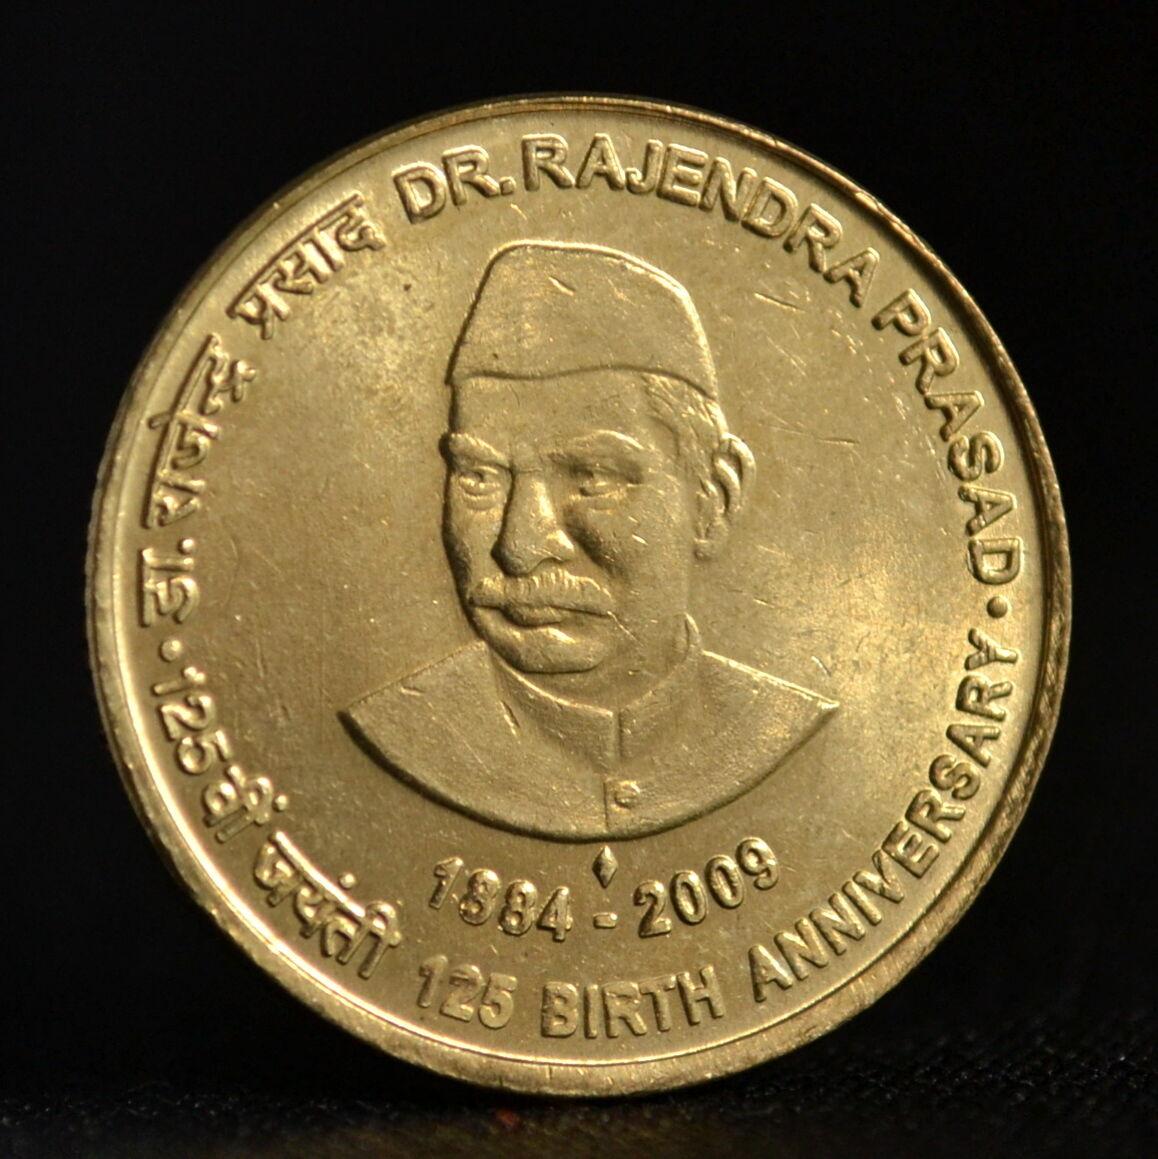 125th Birth Anniversary India-republic 5 Rupees Rajendra Prasad Dr 2009